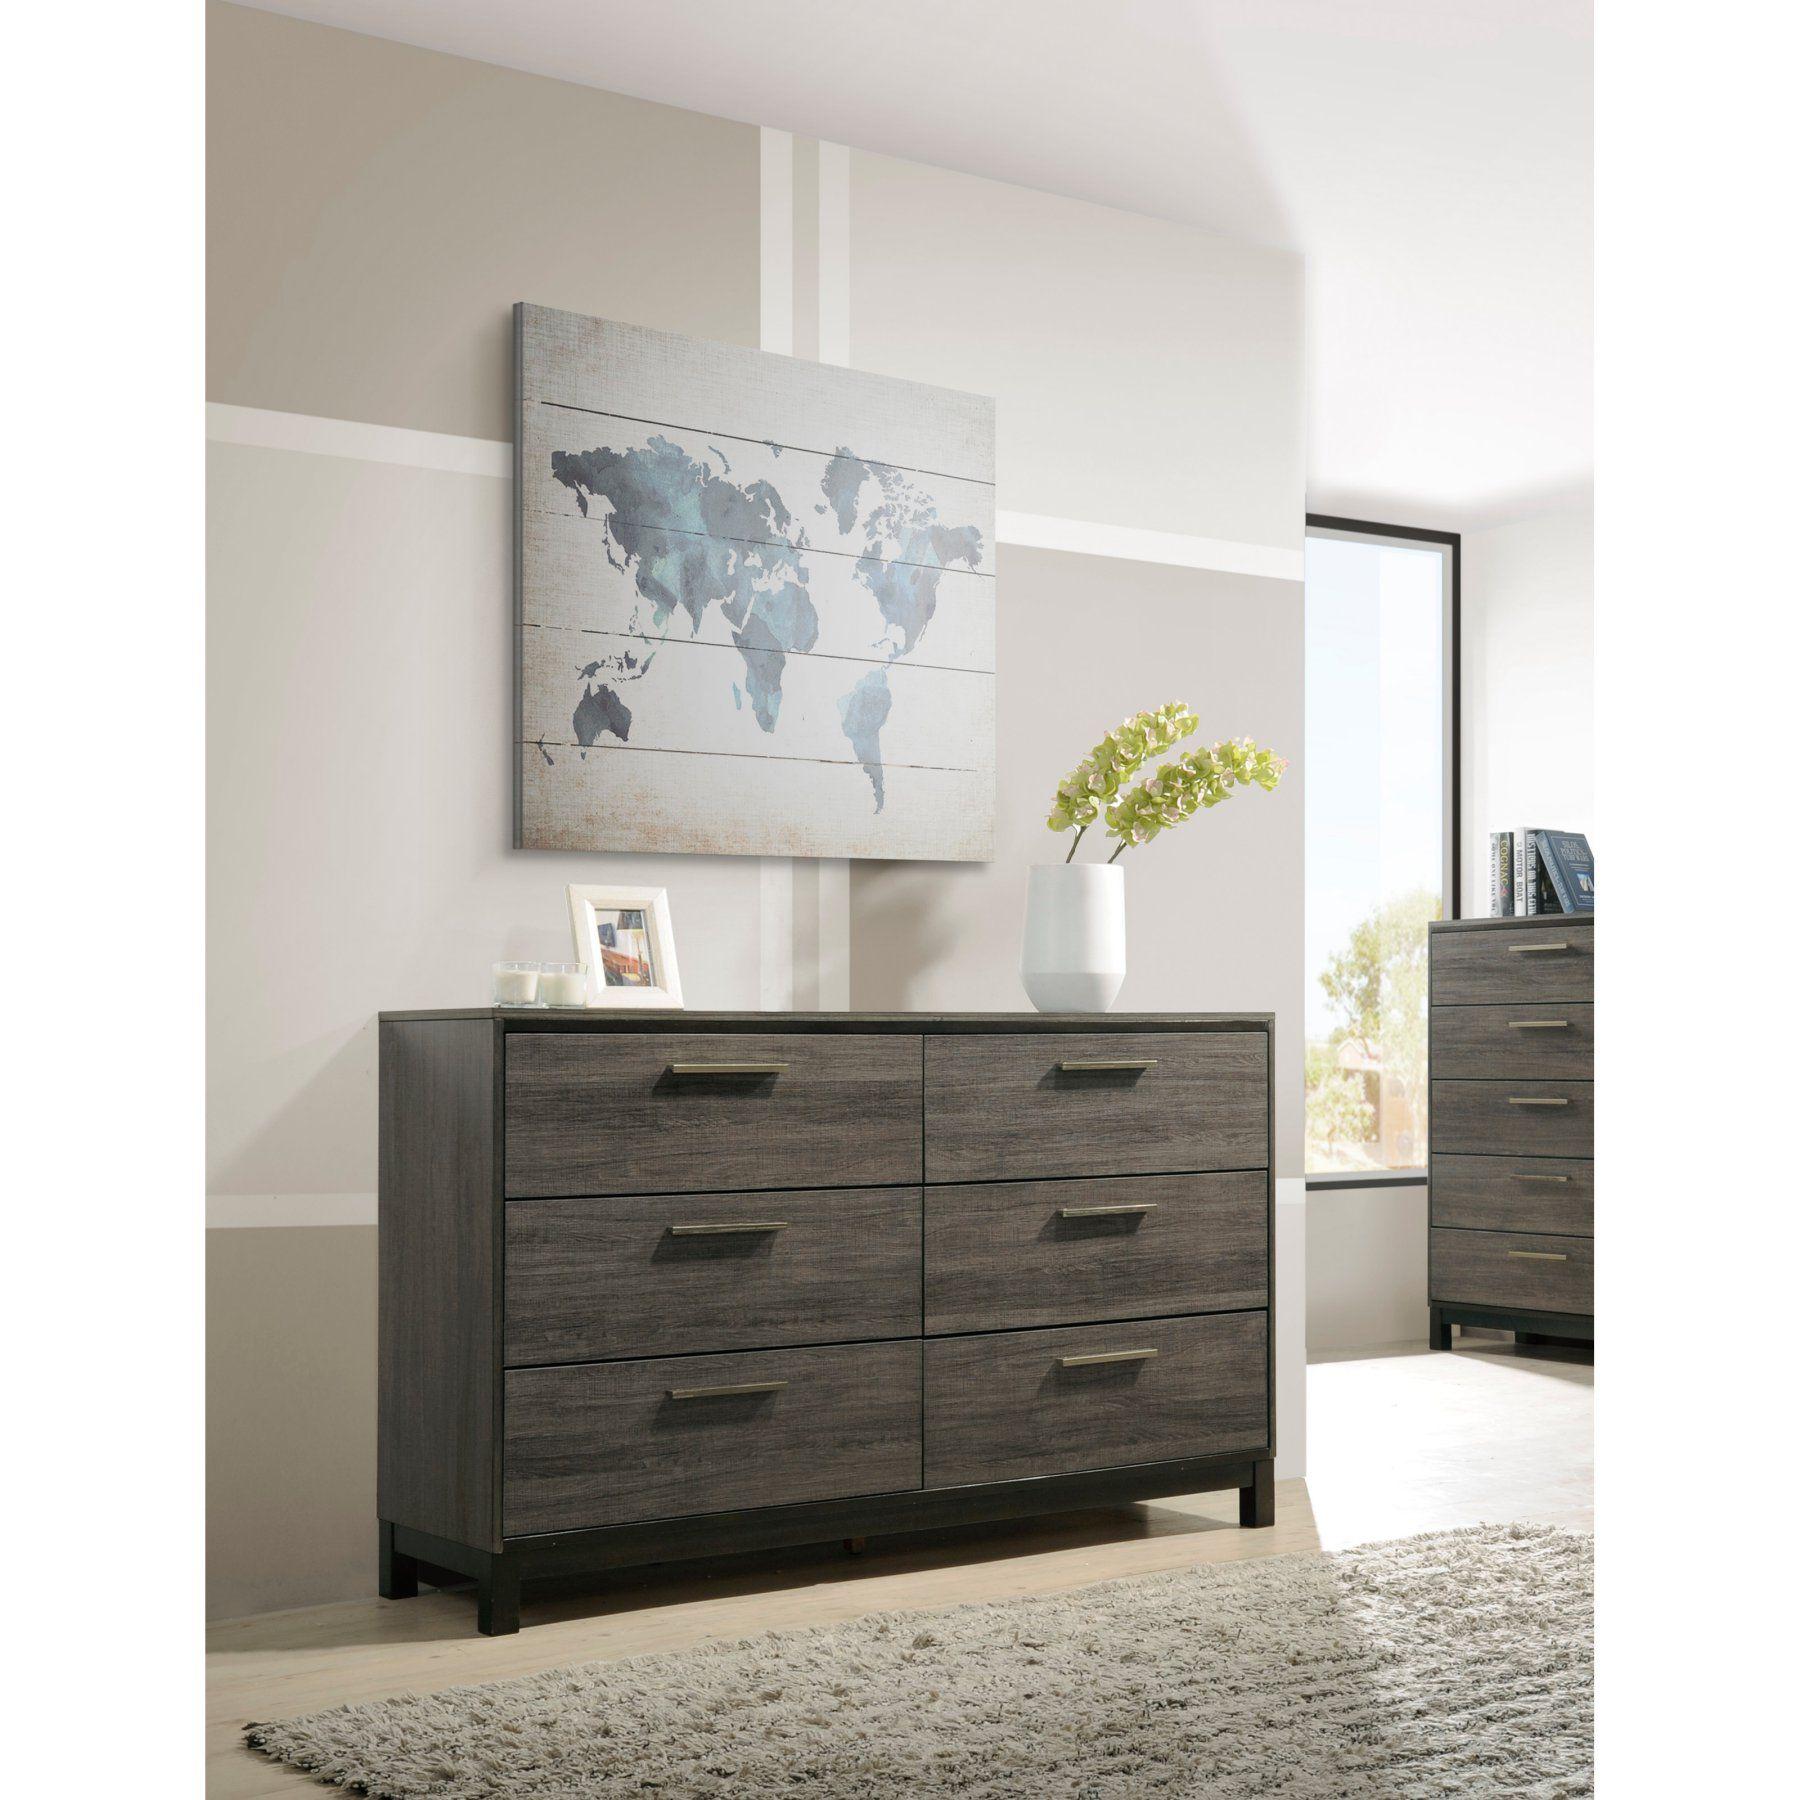 Roundhill Furniture Ioana 6 Drawer Dresser - B187D ...